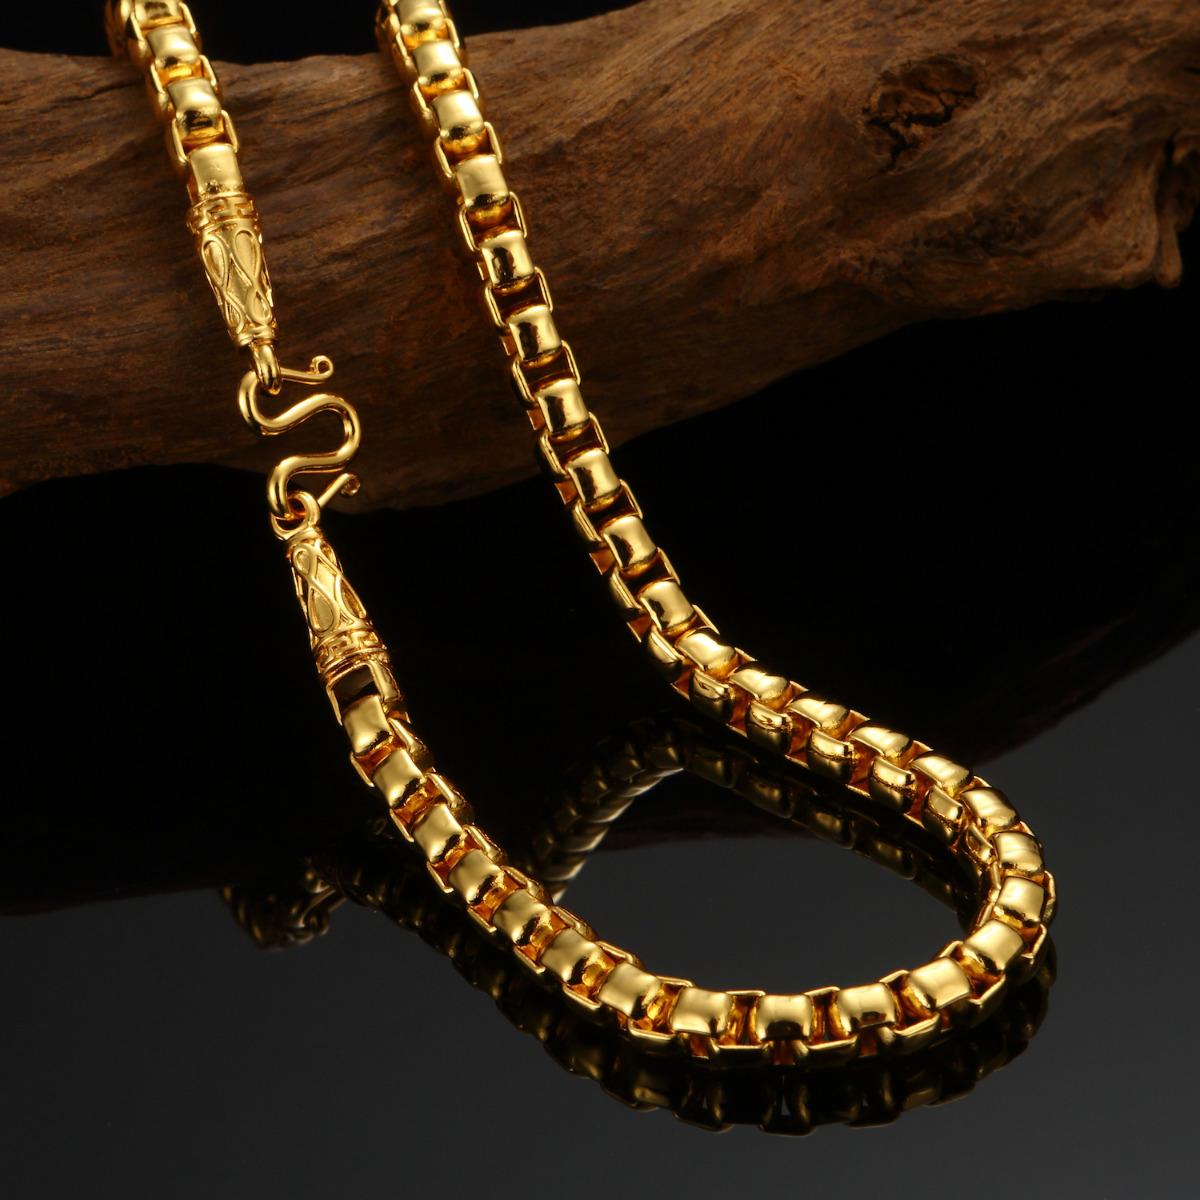 24K Goldkette Ketten gold Halskette massiv Panzerkette